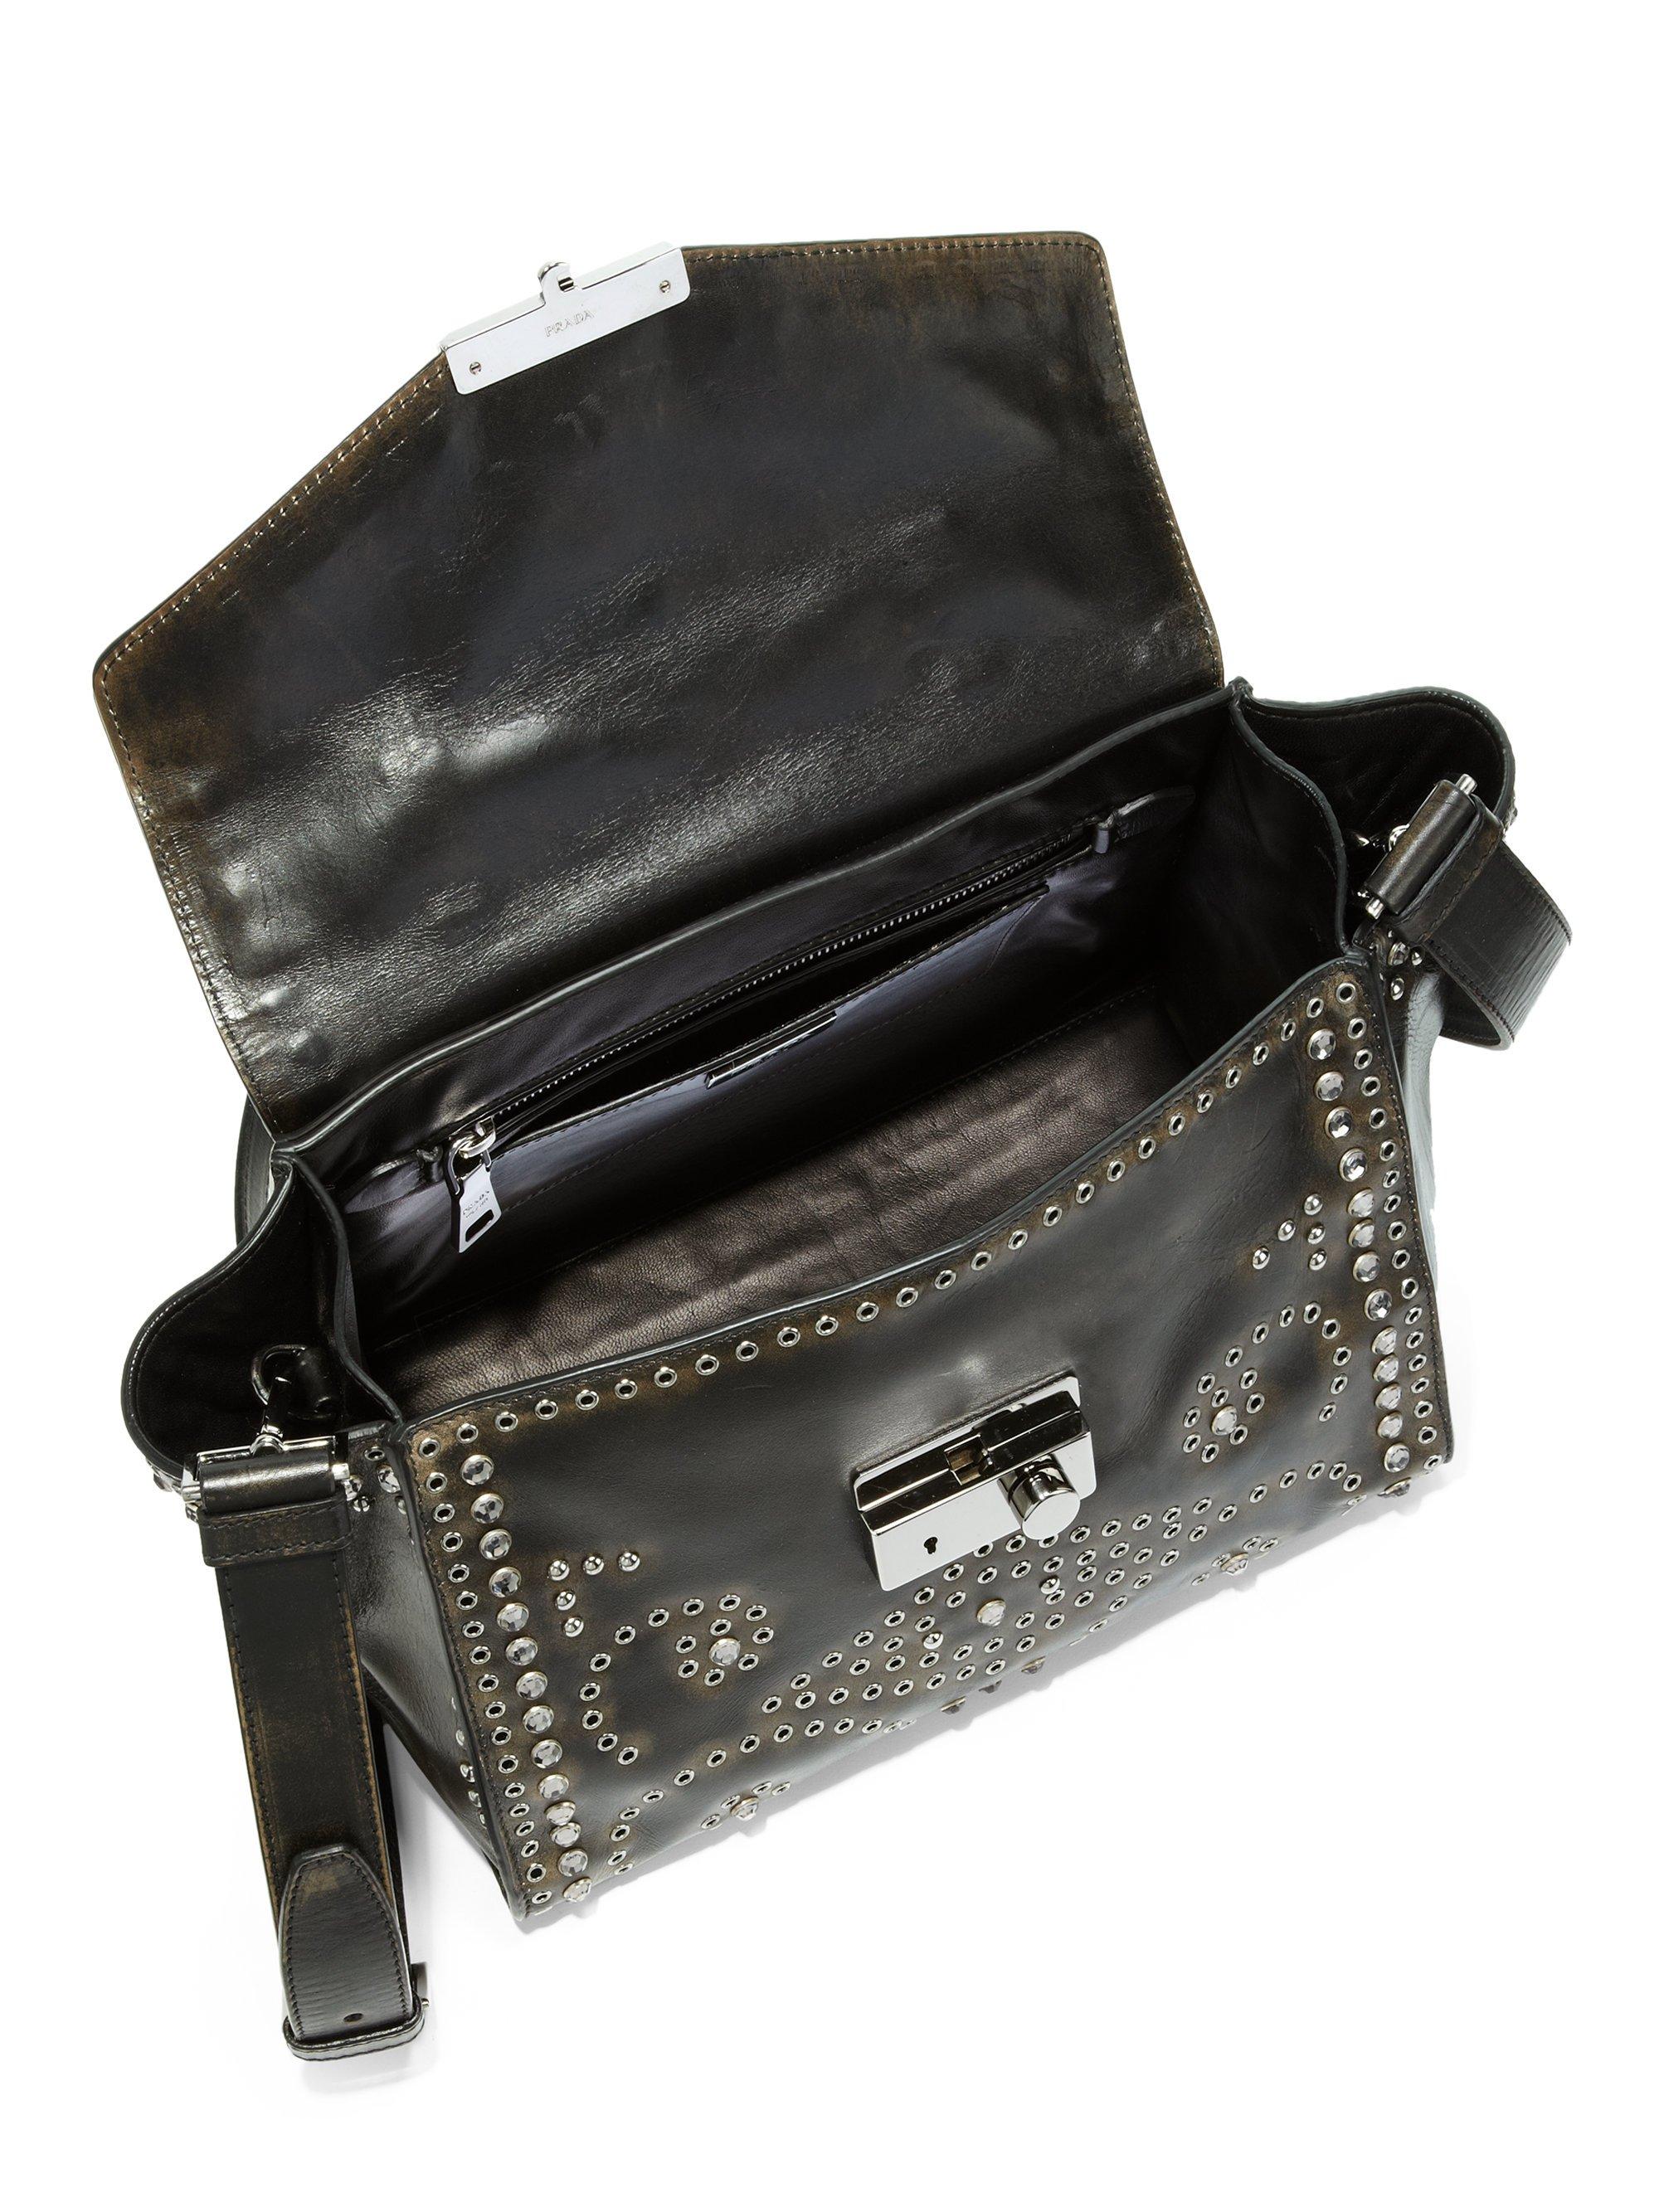 buy prada bag - Prada Vitello Vintage Embellished Shoulder Bag in Brown | Lyst